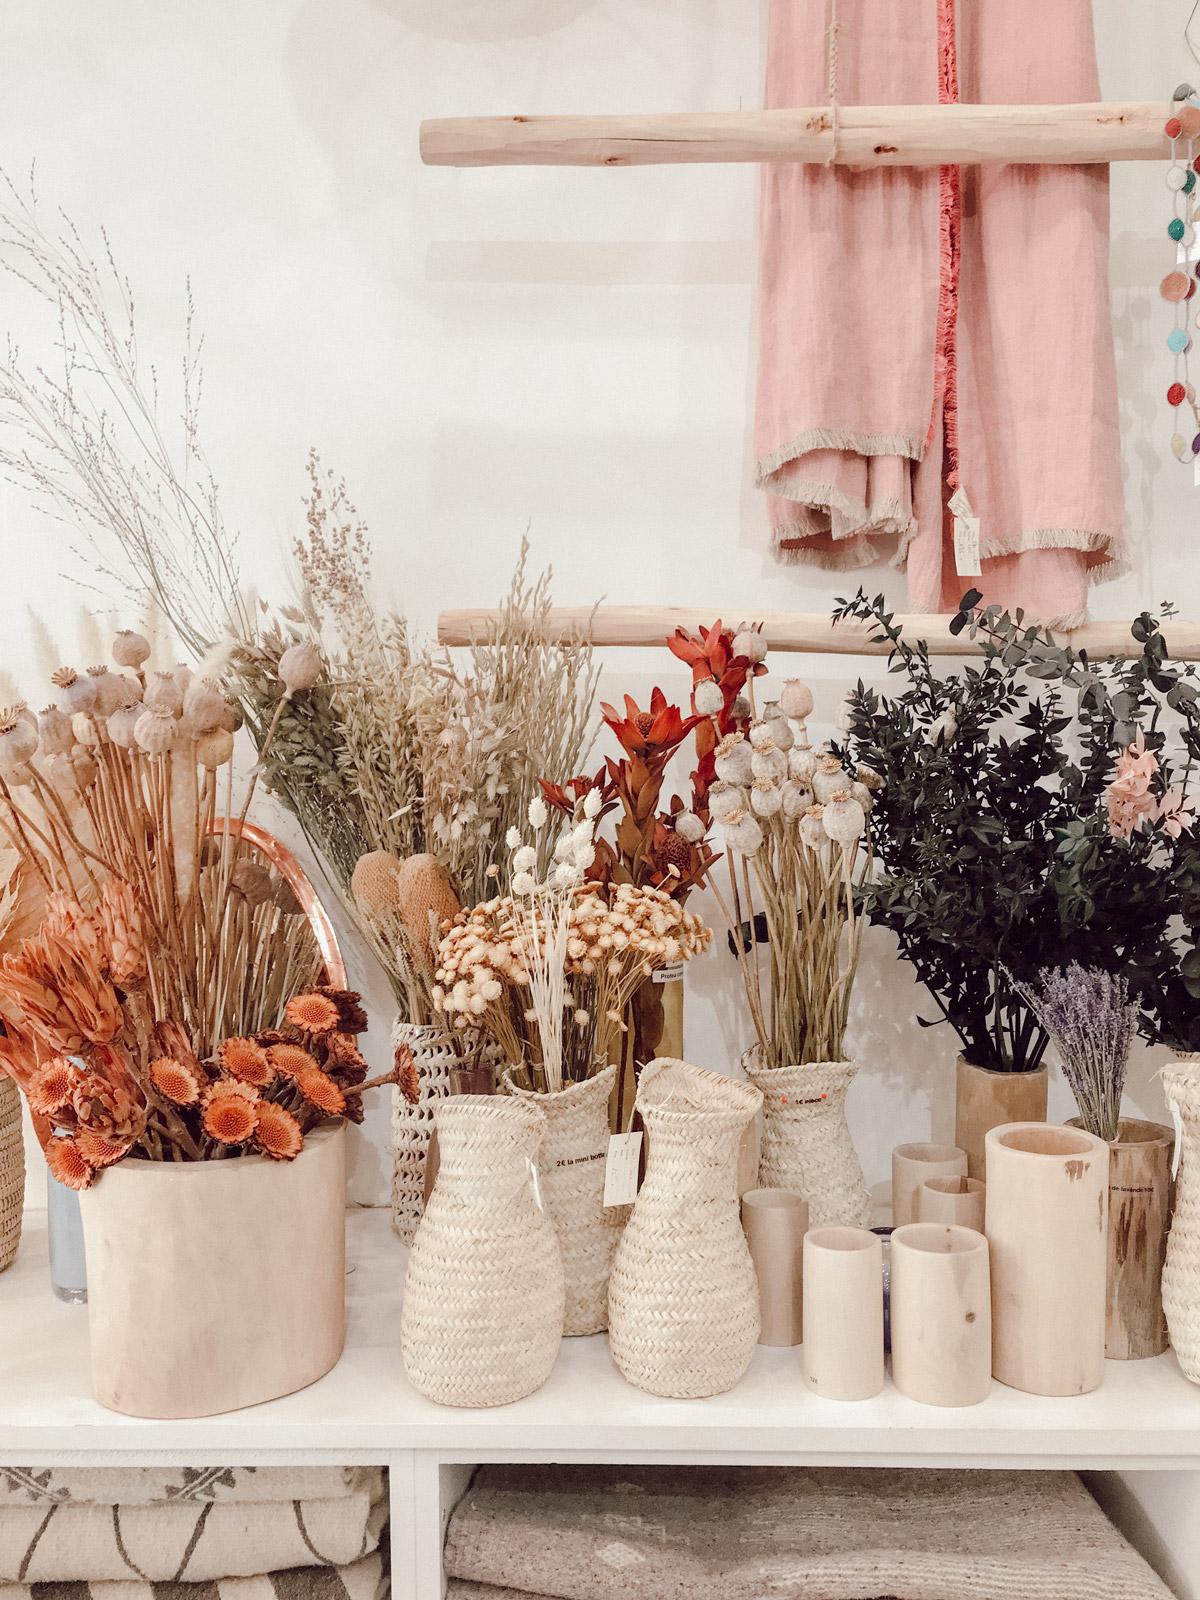 pompon-bazar-paris-magasin-paniers-tapis-berberes